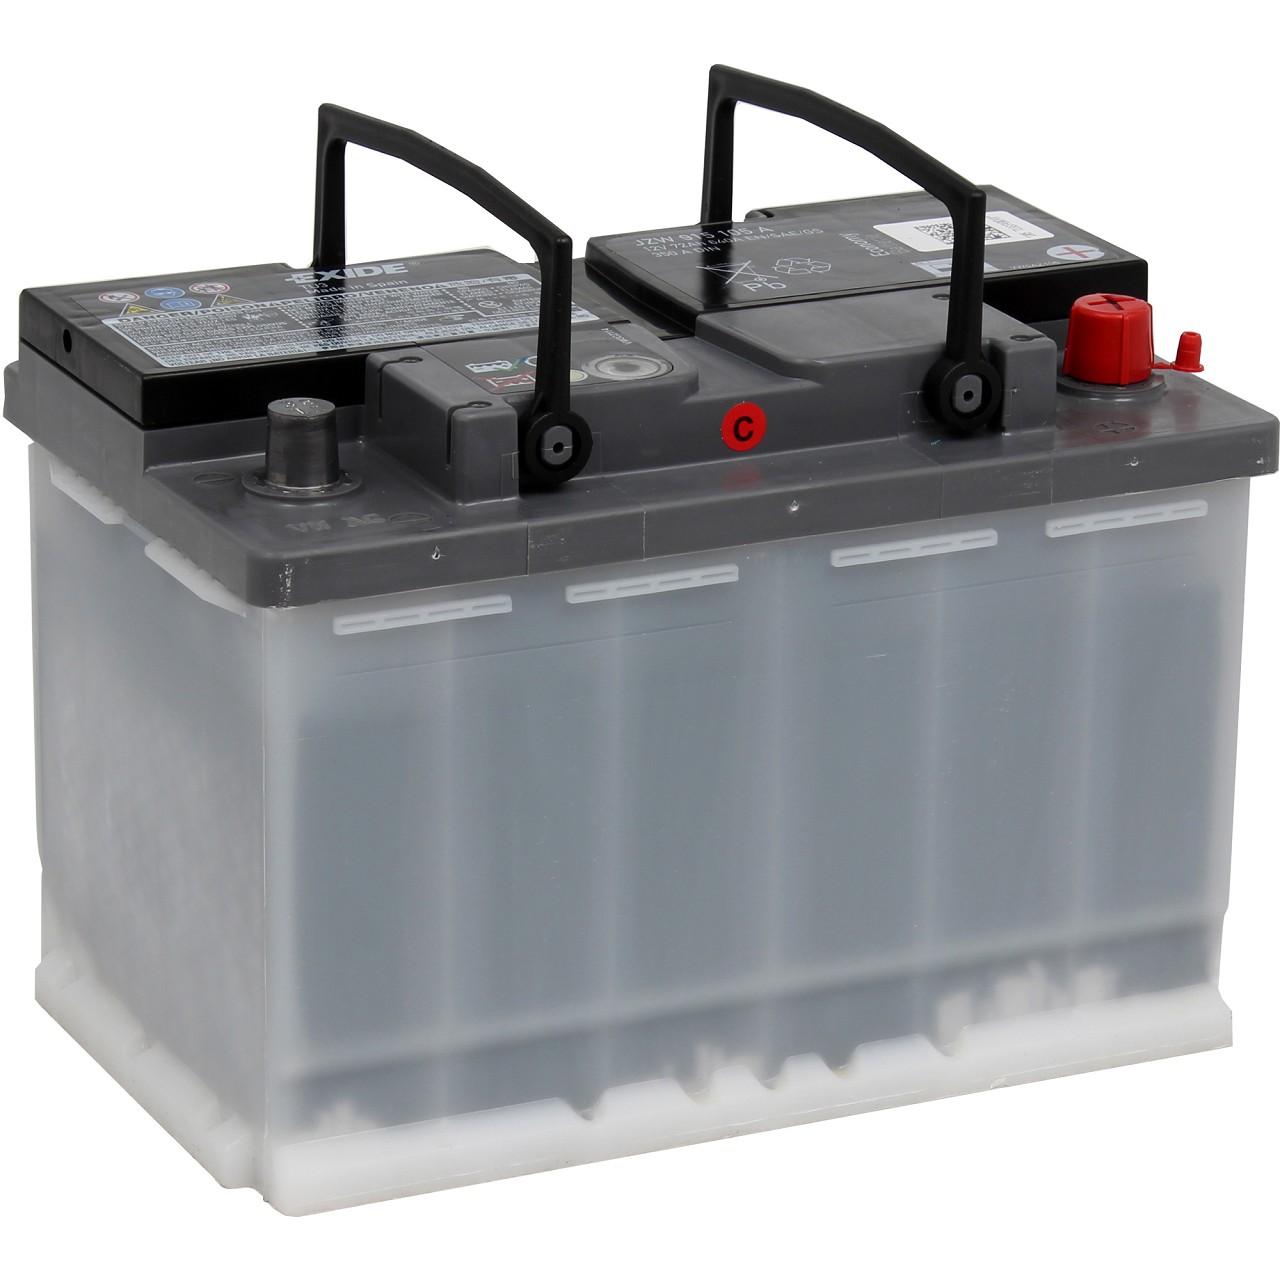 ORIGINAL VW Autobatterie Batterie Starterbatterie 12V 72Ah 350/640A JZW915105A